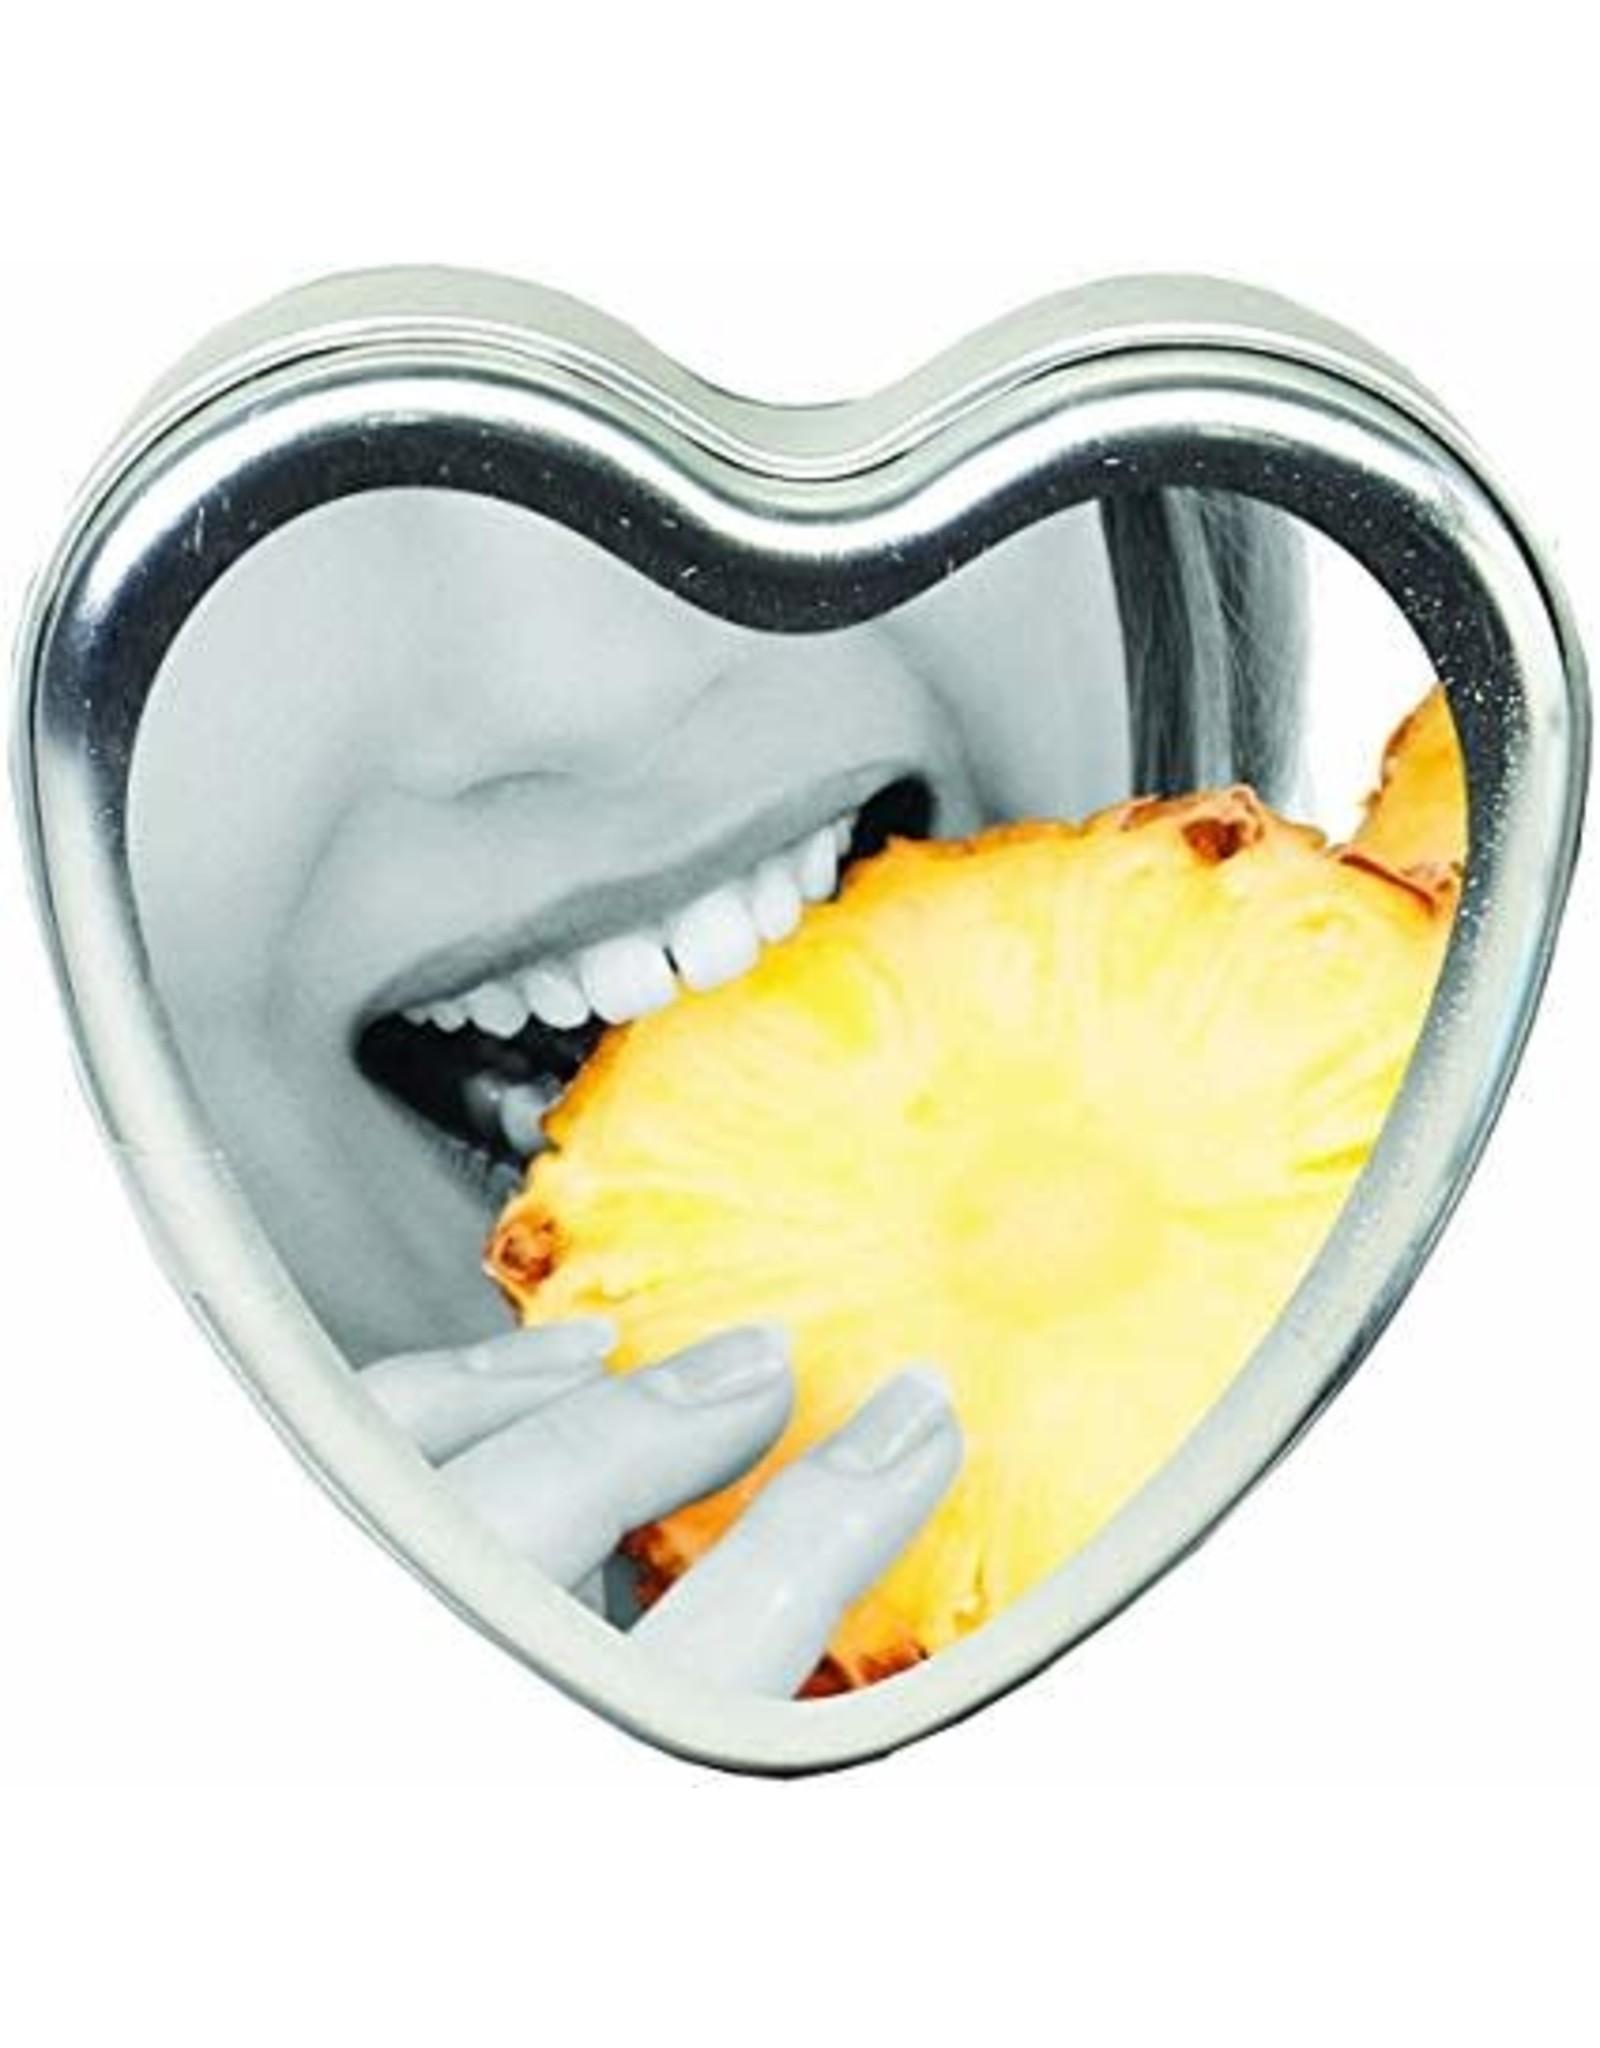 EARTHLY BODY EARTHLY BODY - EDIBLE TROPICAL HEART CANDLES 4OZ - PINEAPPLE